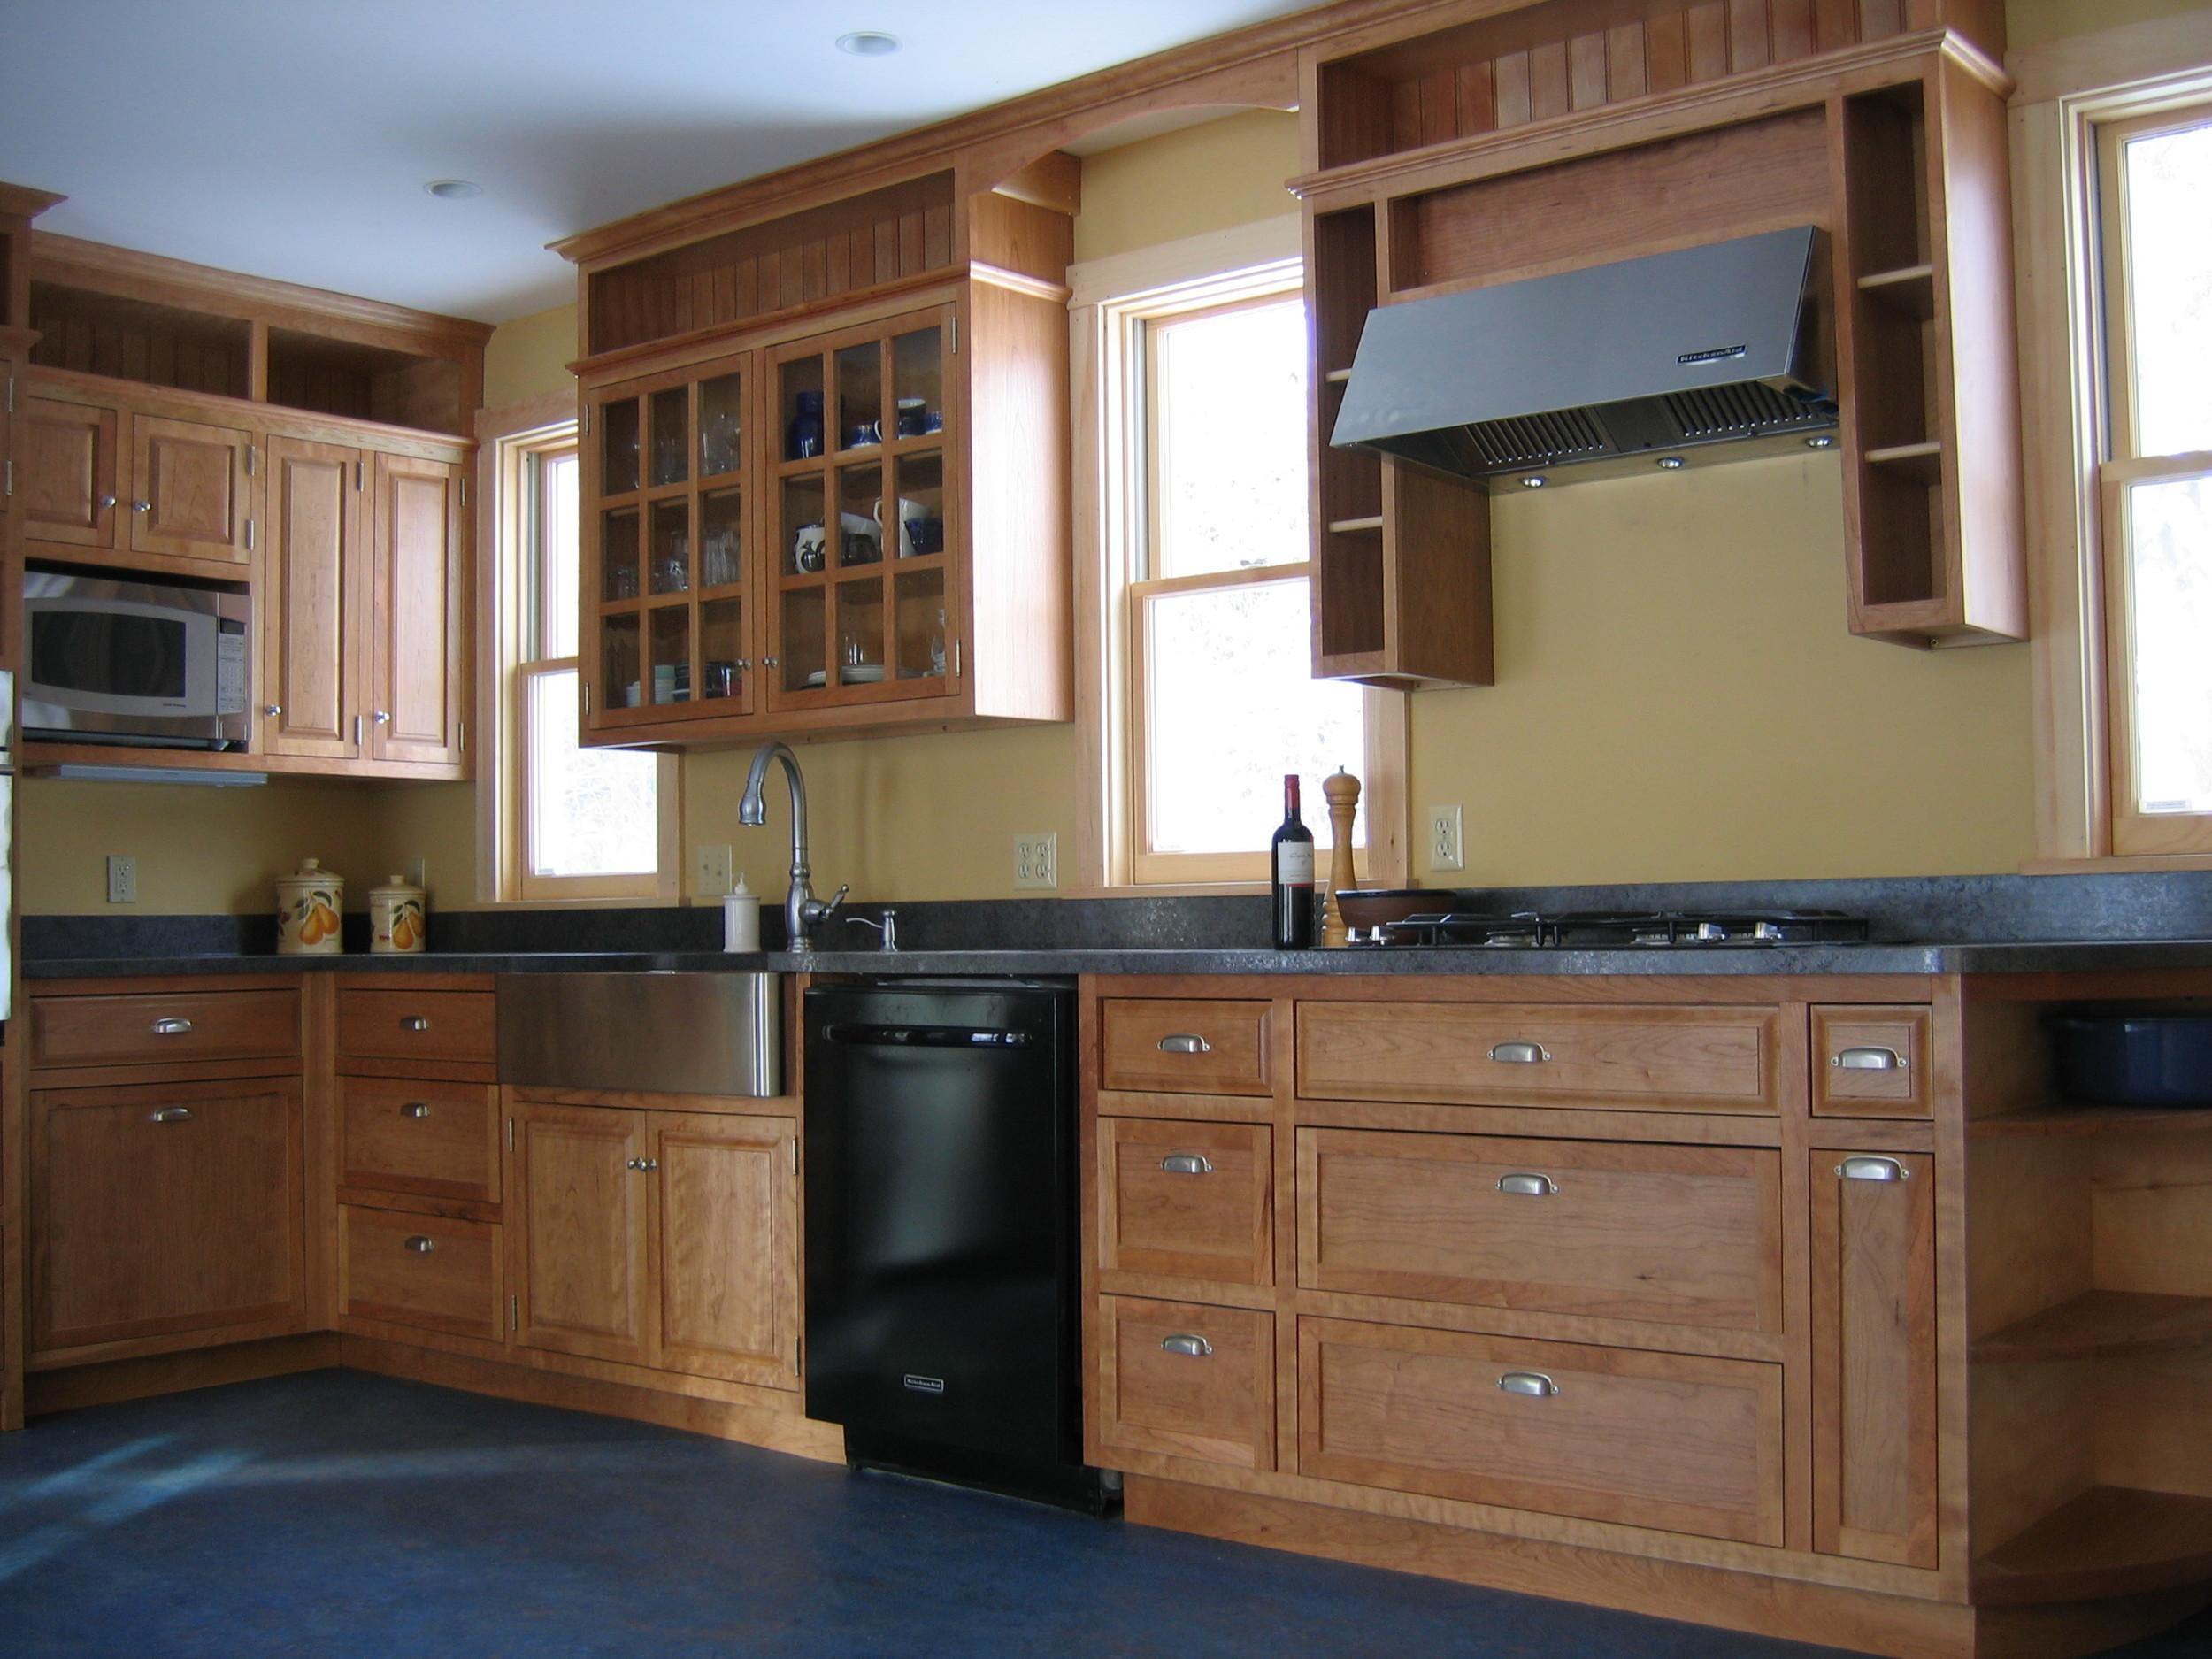 Residential kitchen remodel, Shelburne Falls MA